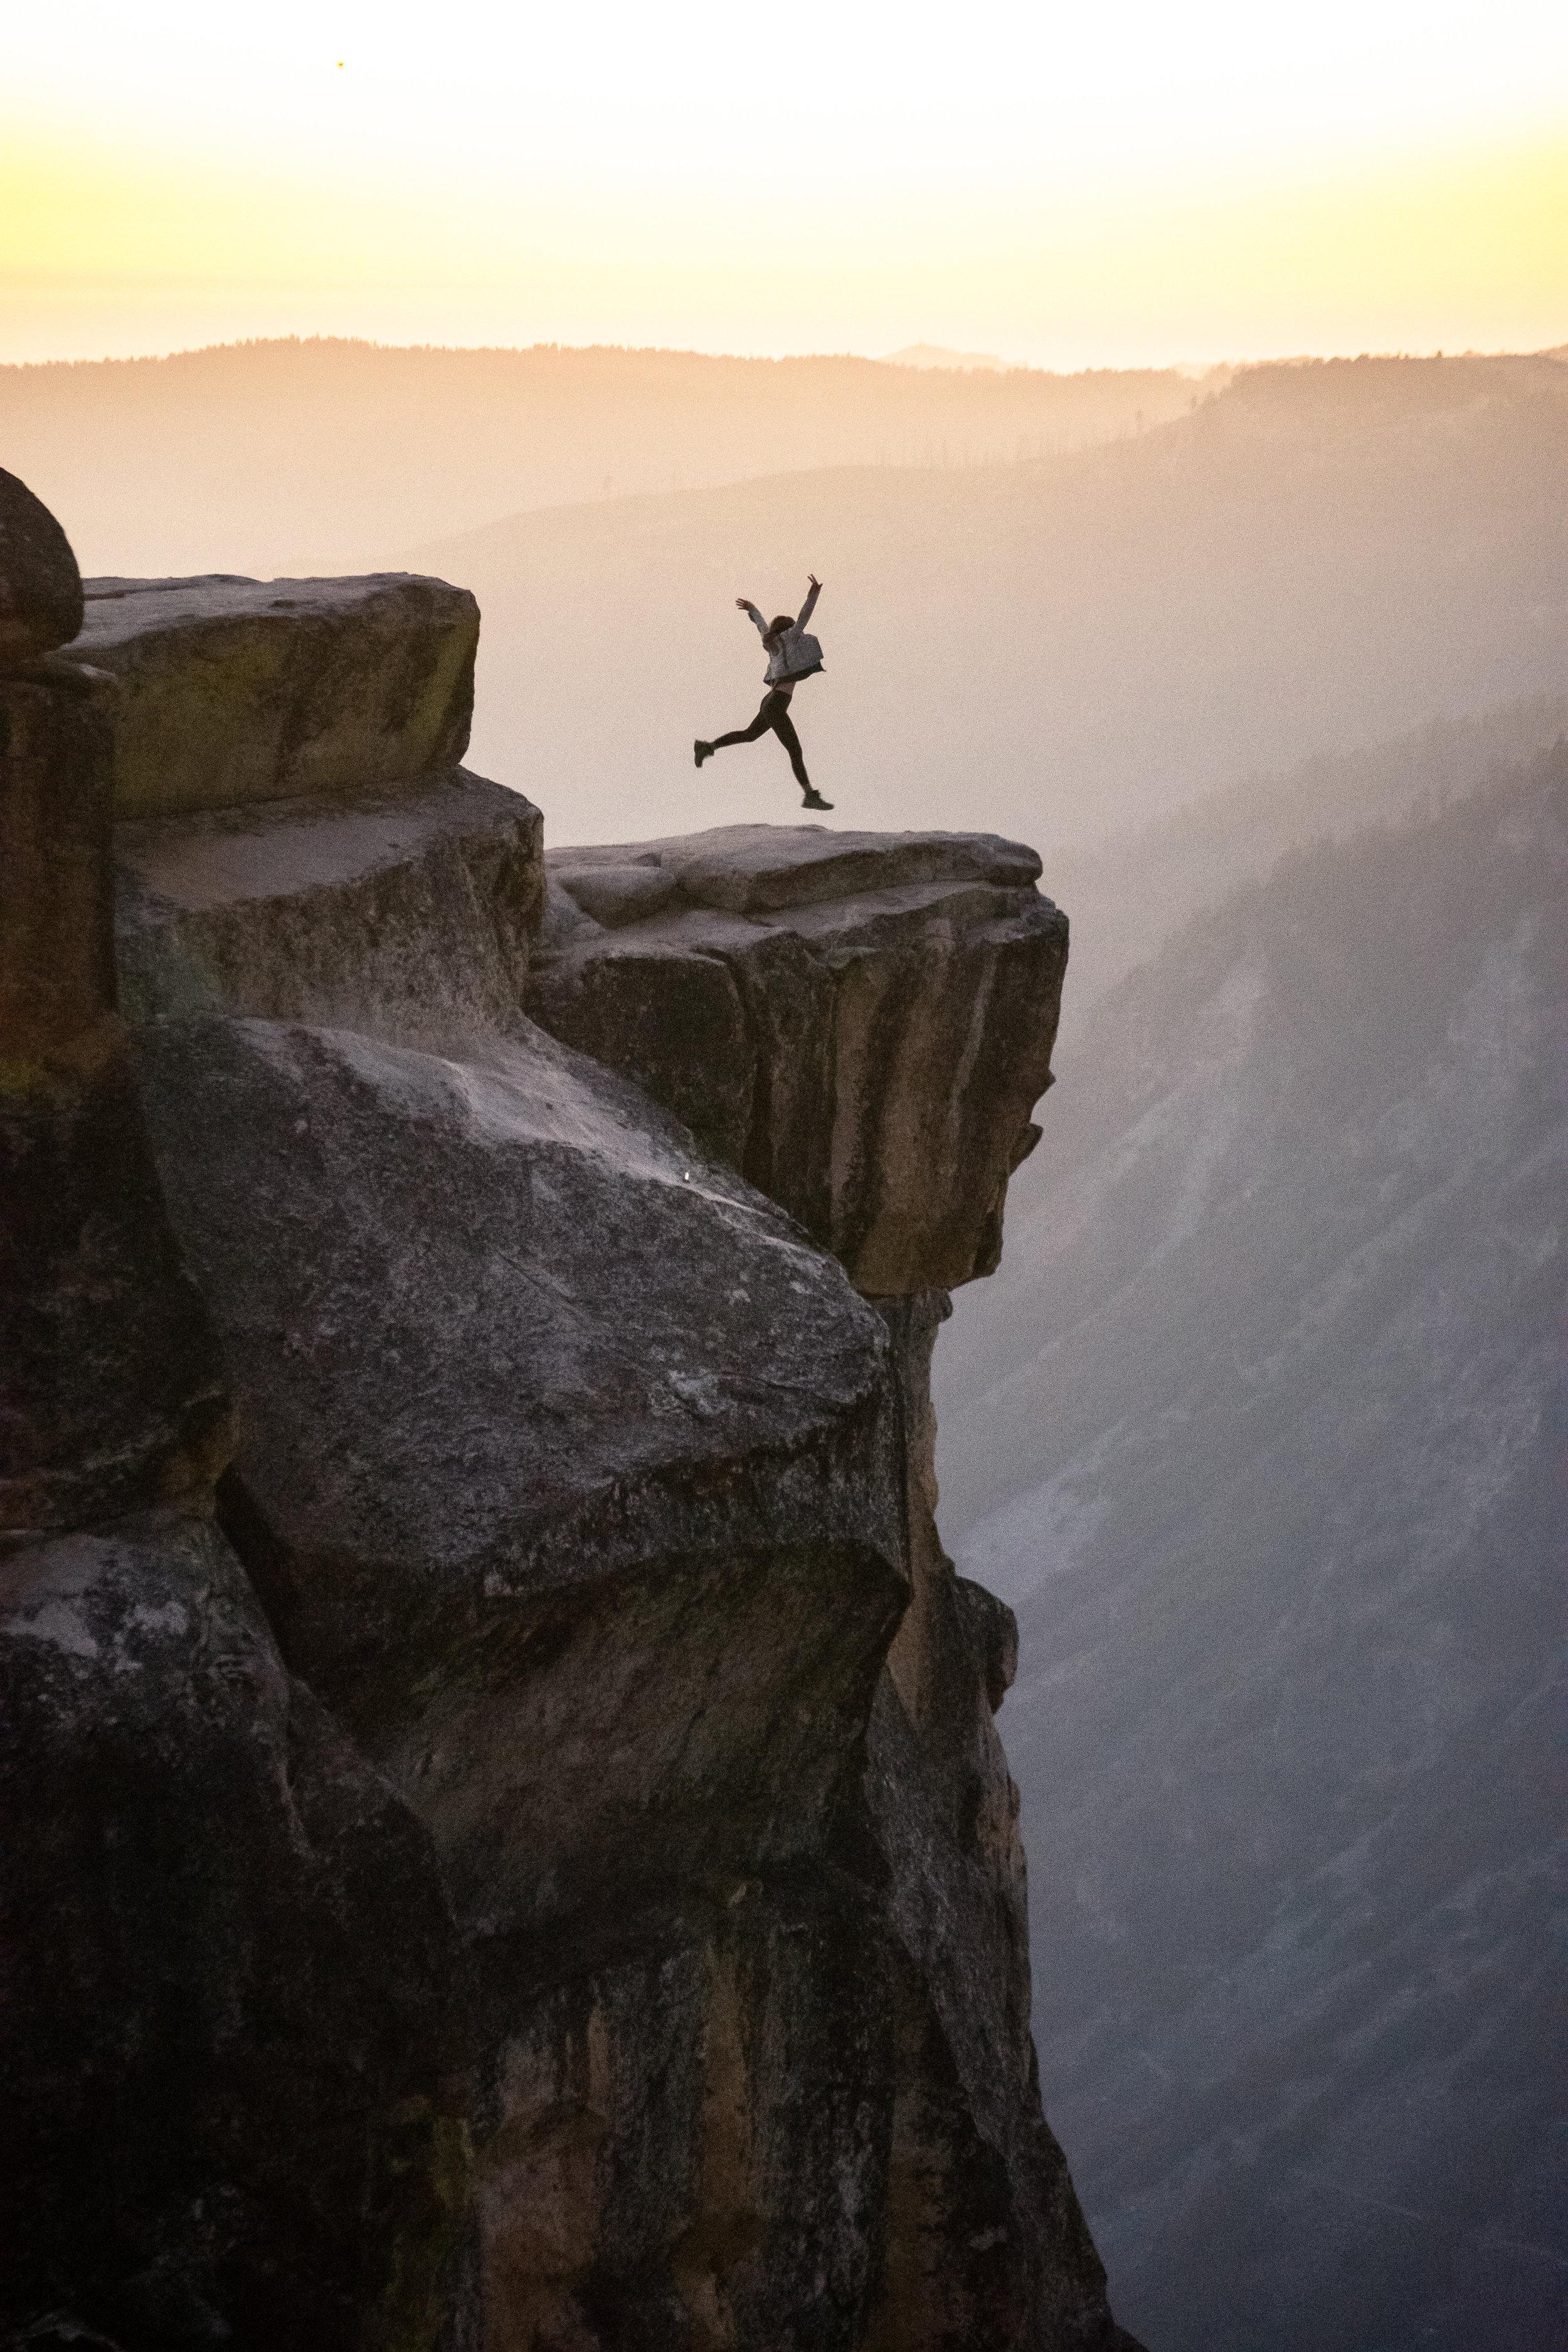 Taft Point Yosemite National Park